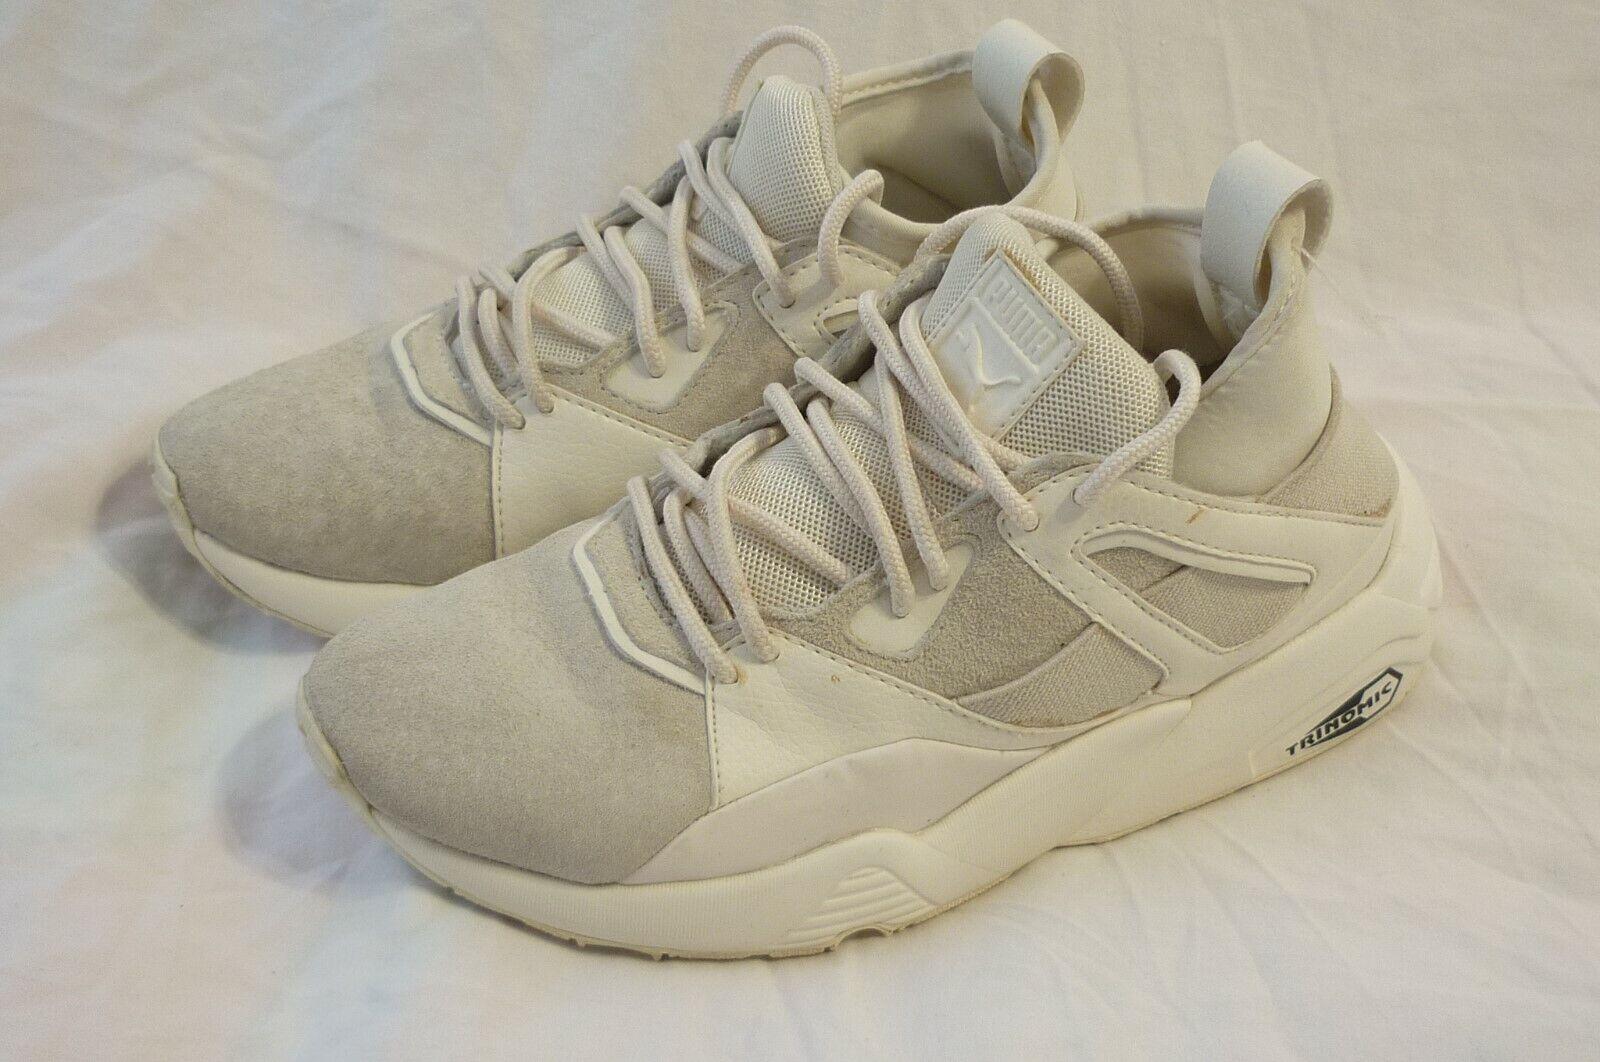 Puma Blaze of Glory Bog Chaussures femme taille 5.5 ou Hommes 4 blanc Excellent!